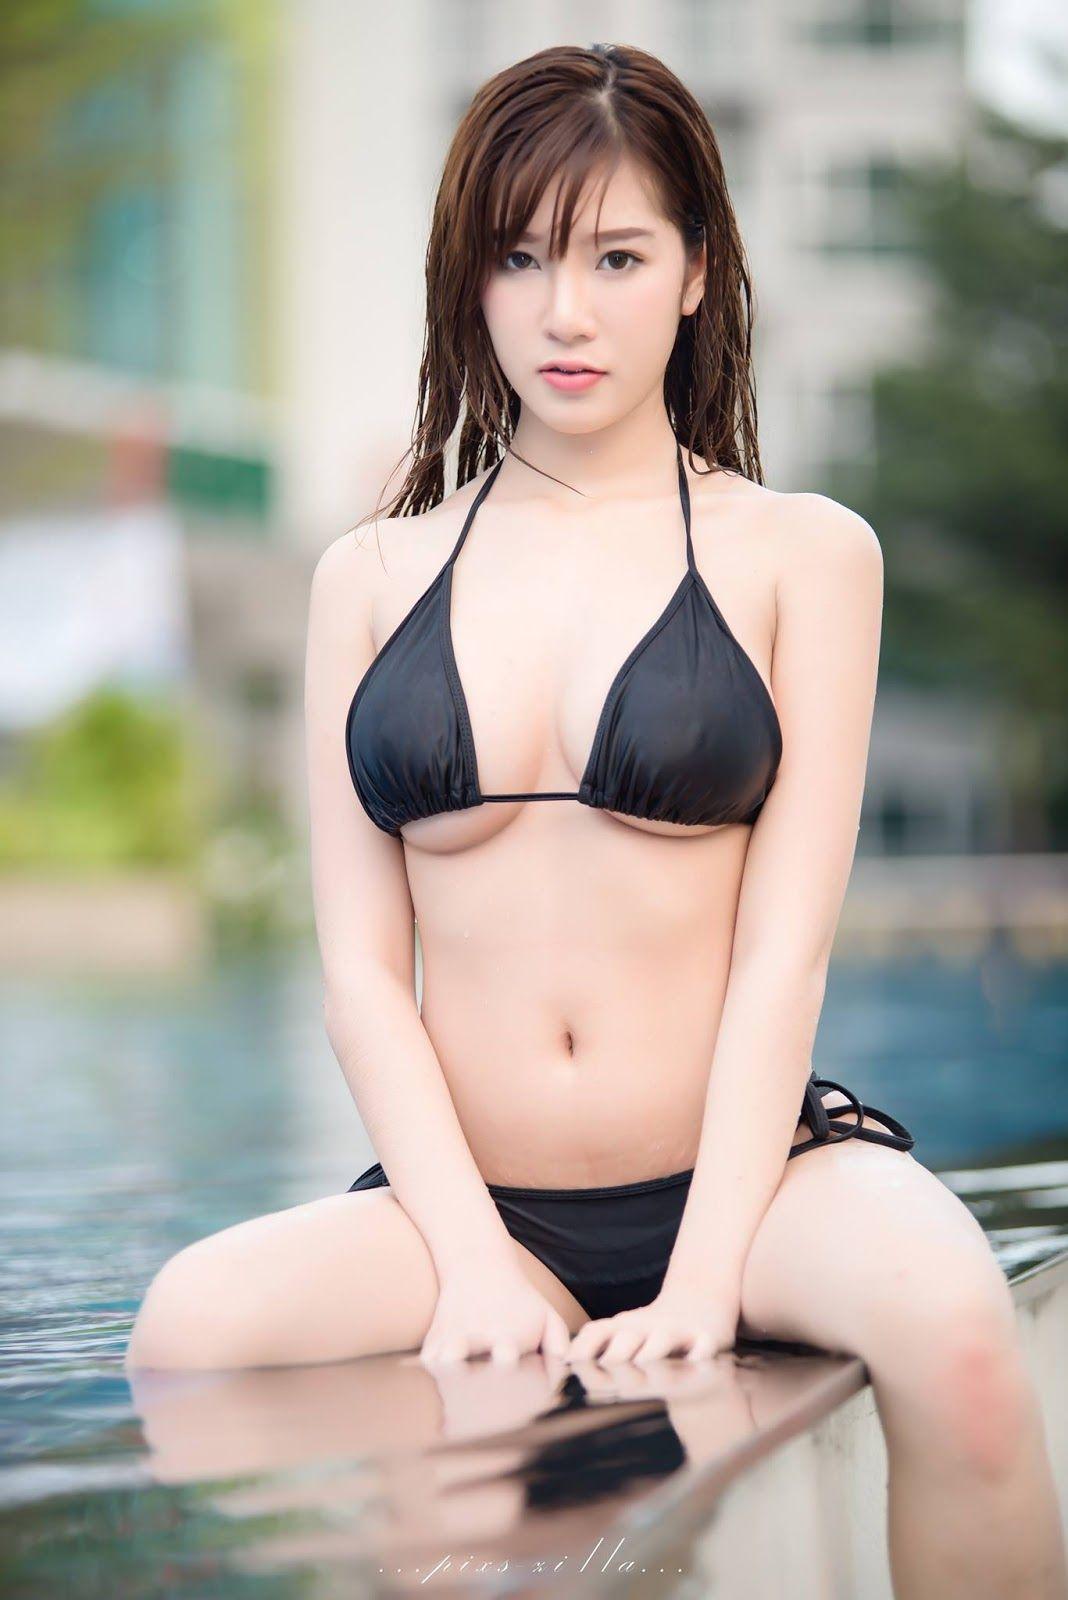 Pin On Thailand Girl-4640